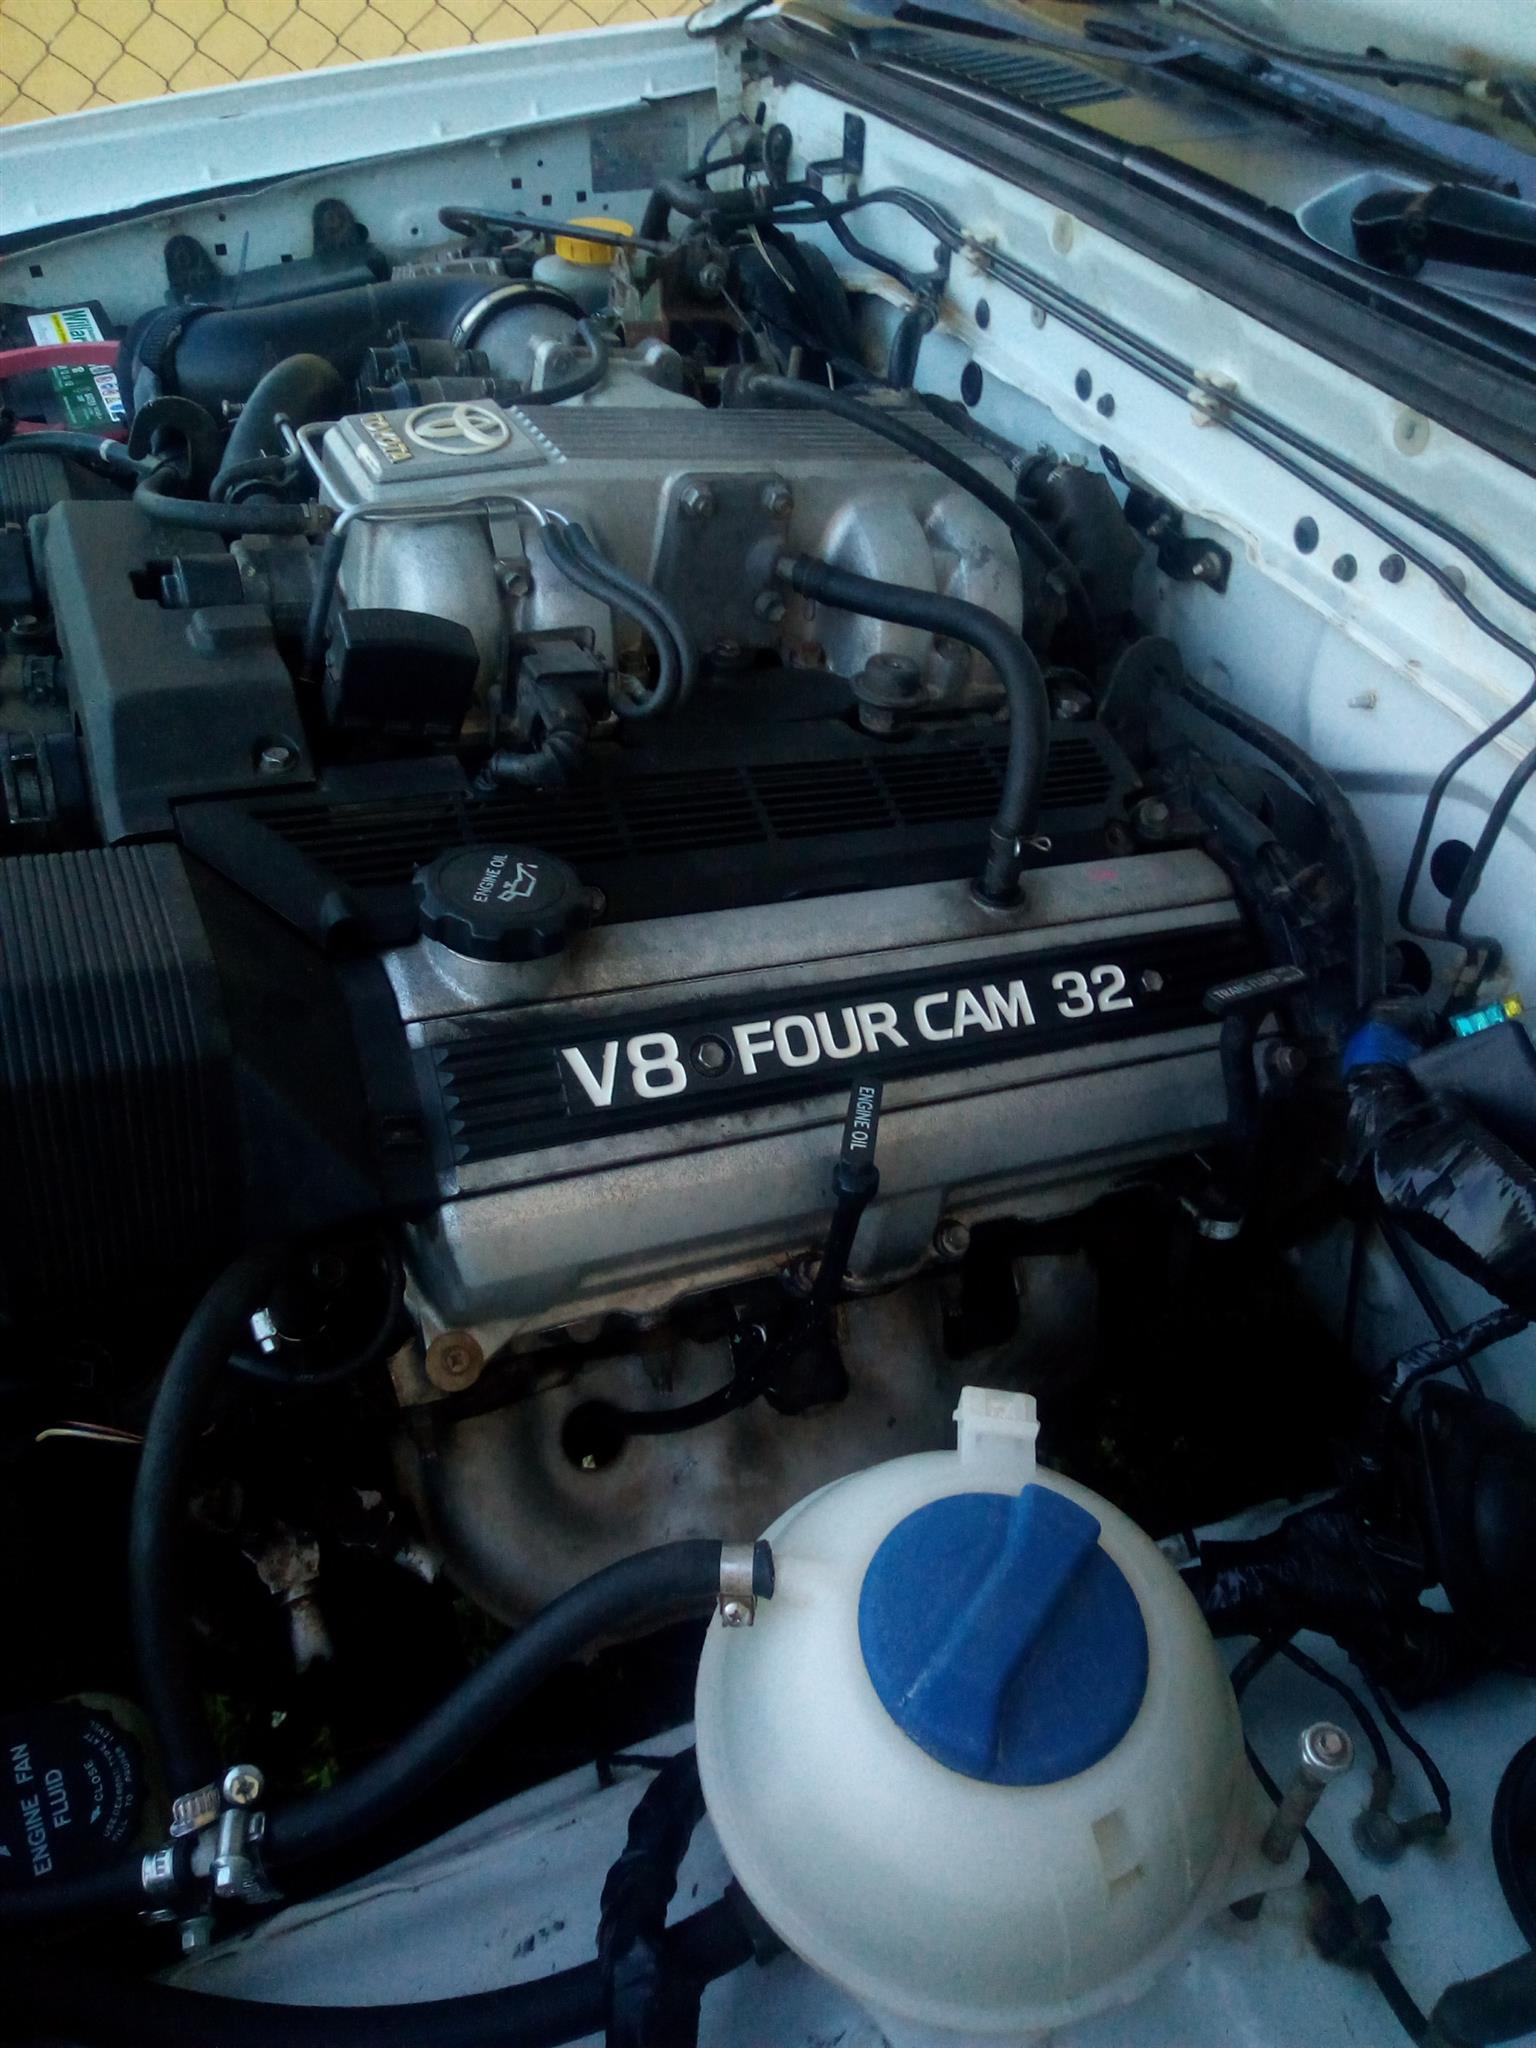 2008 Nissan NP300 Hardbody 2.0 (aircon)